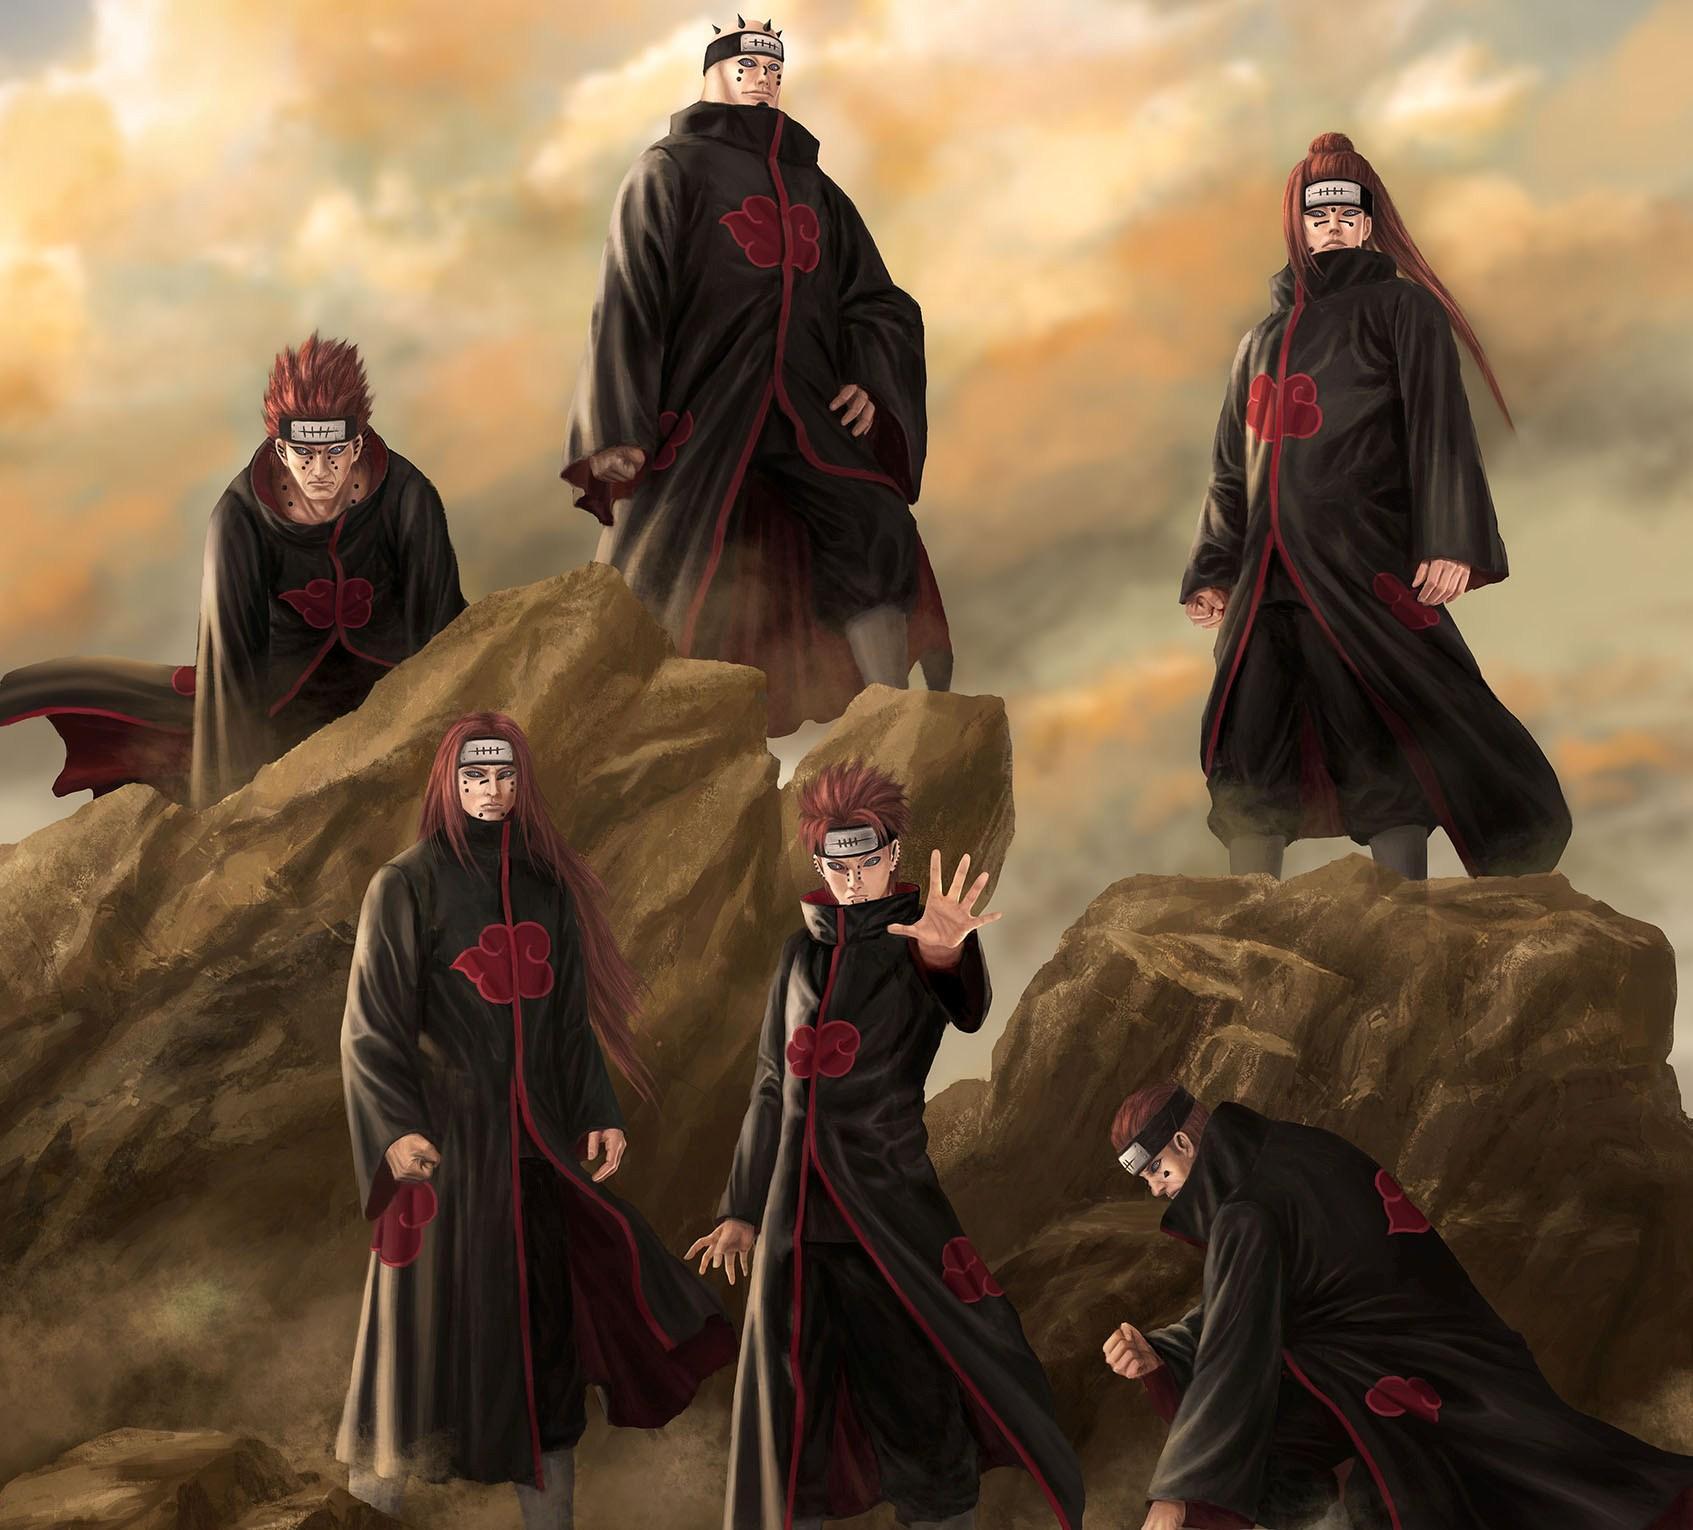 Six paths of pain naruto wallpaper 1693x1530